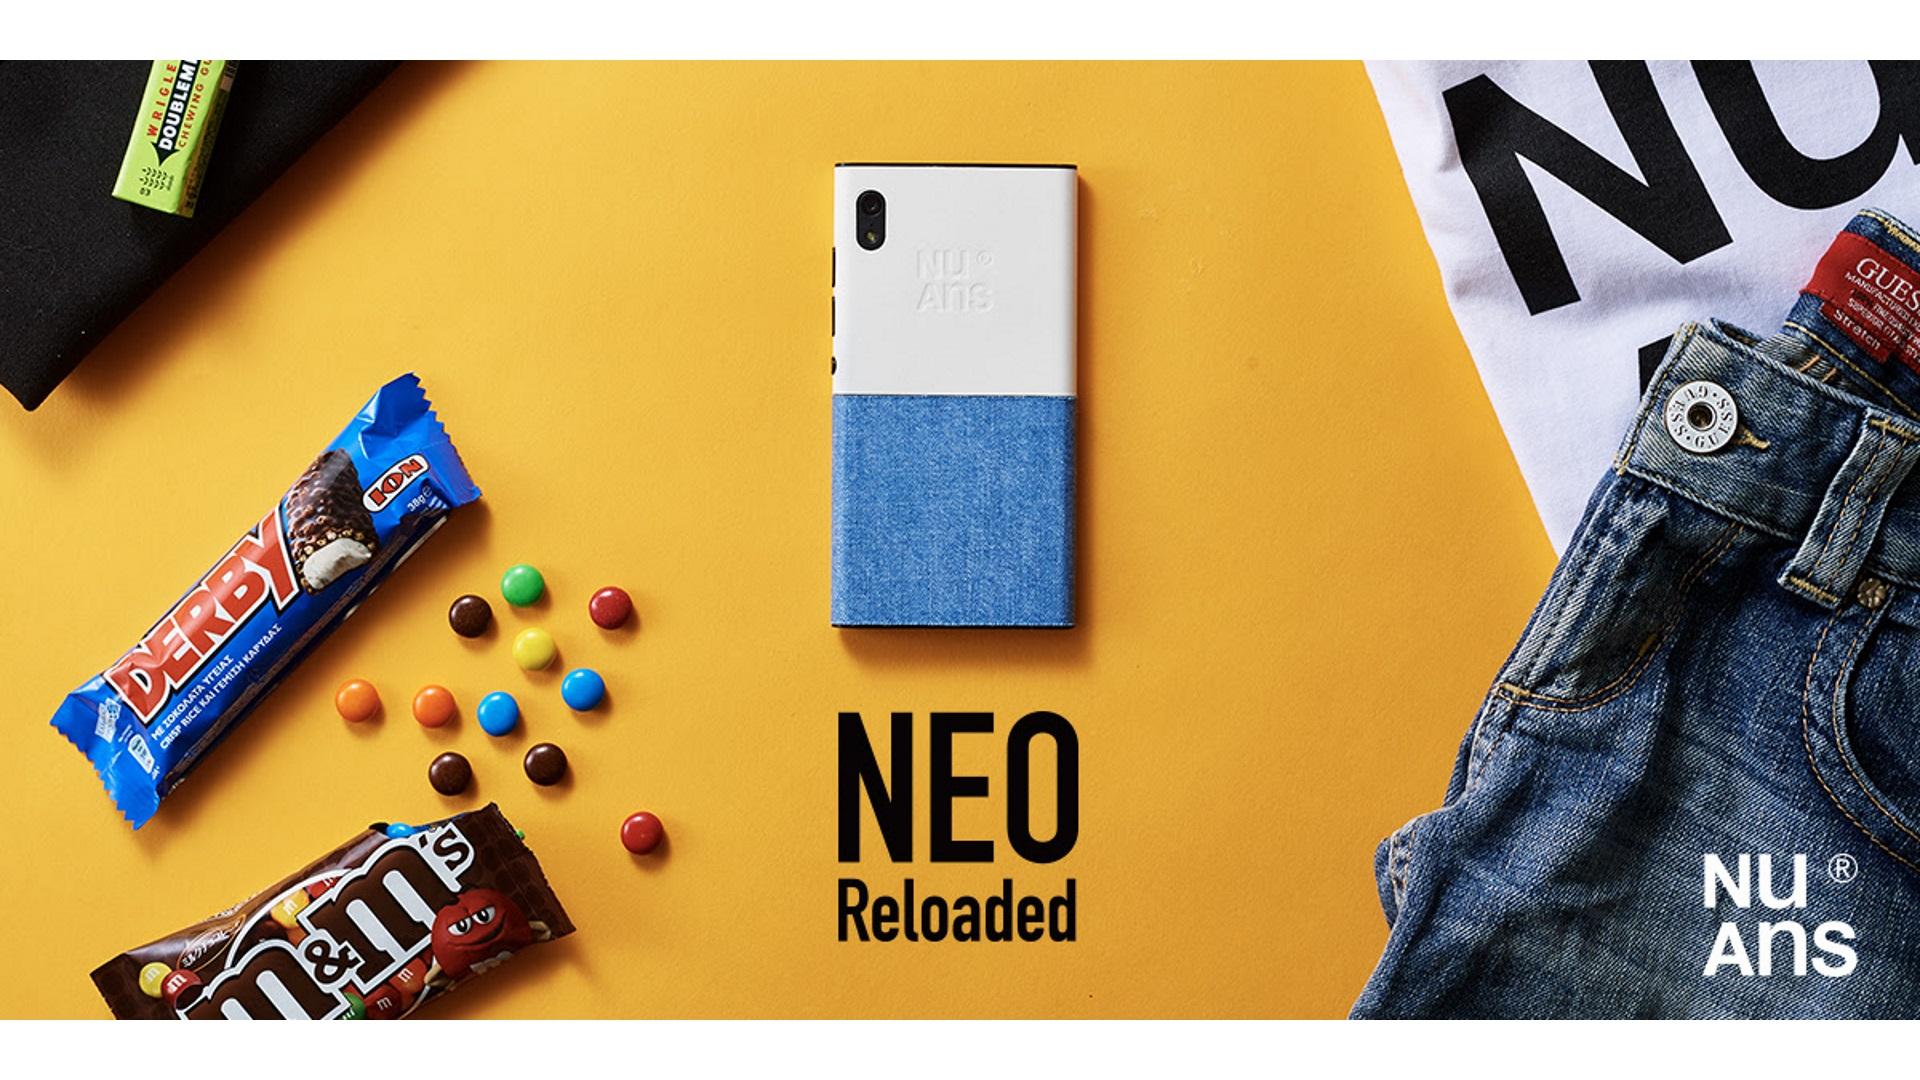 「NuAns NEO [Reloaded]」6月9日発売決定!おサイフケータイのサポートサービスも公開